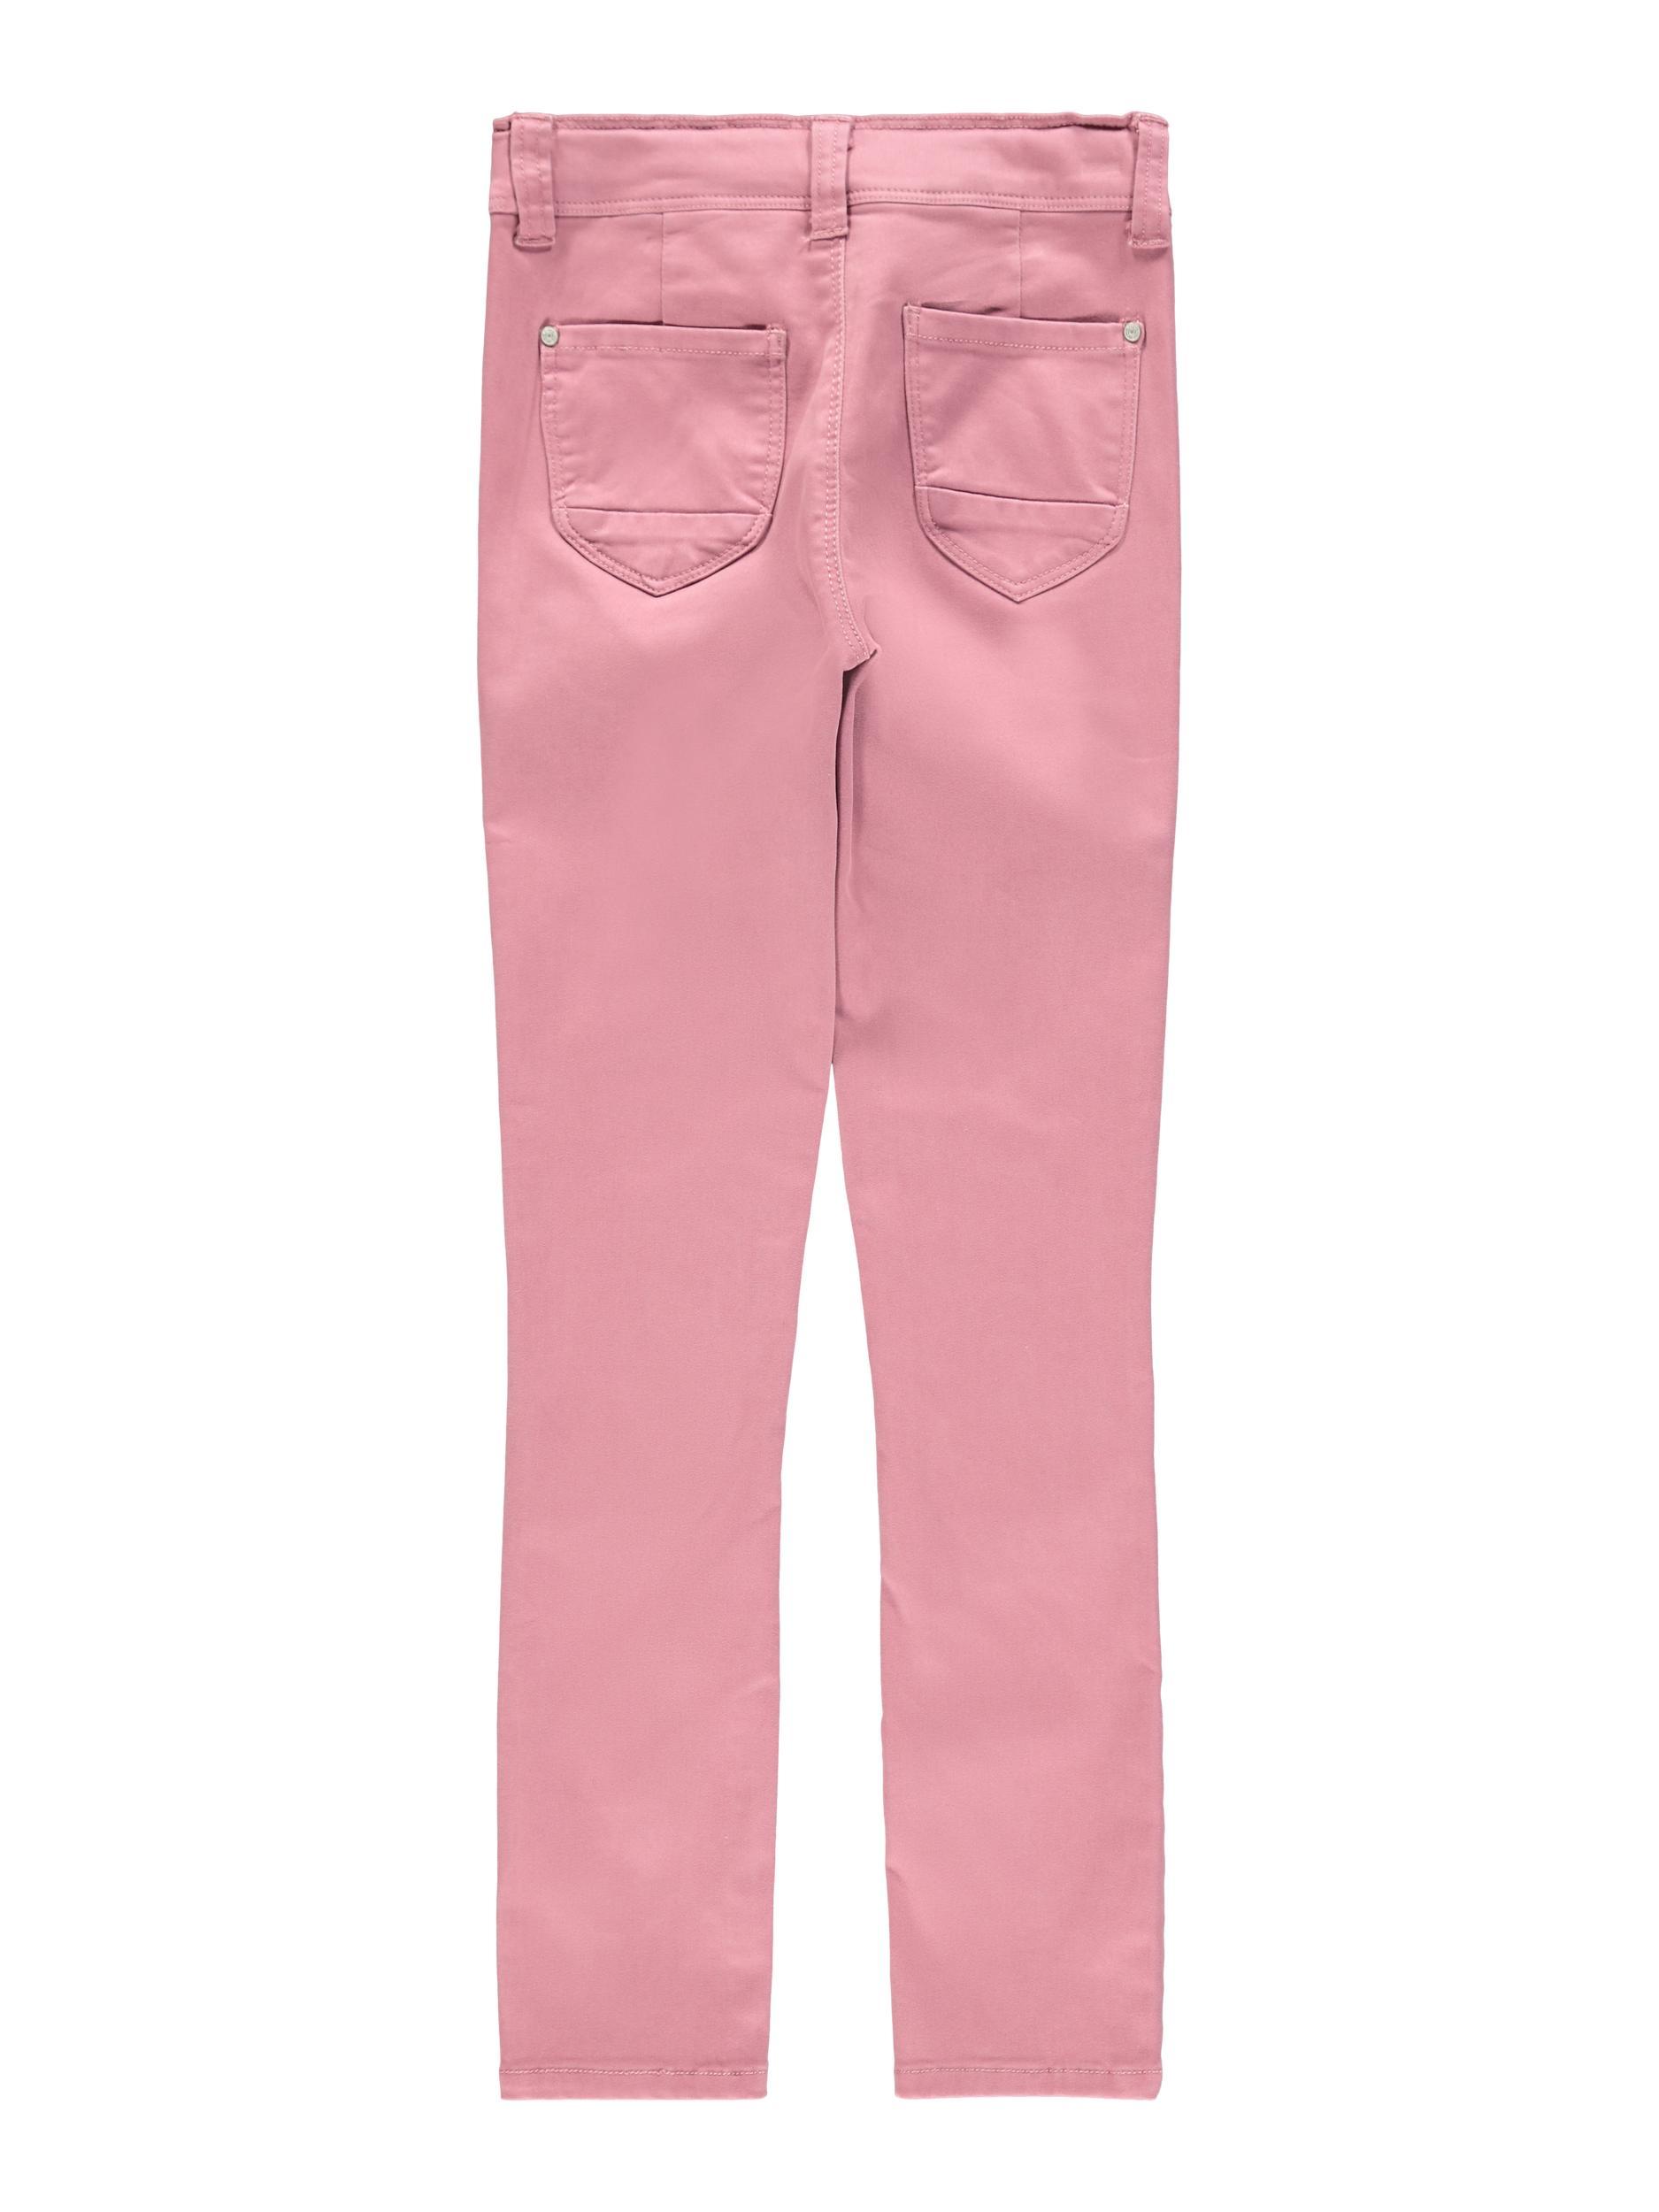 Name It Polly leggings, deco rose, 140